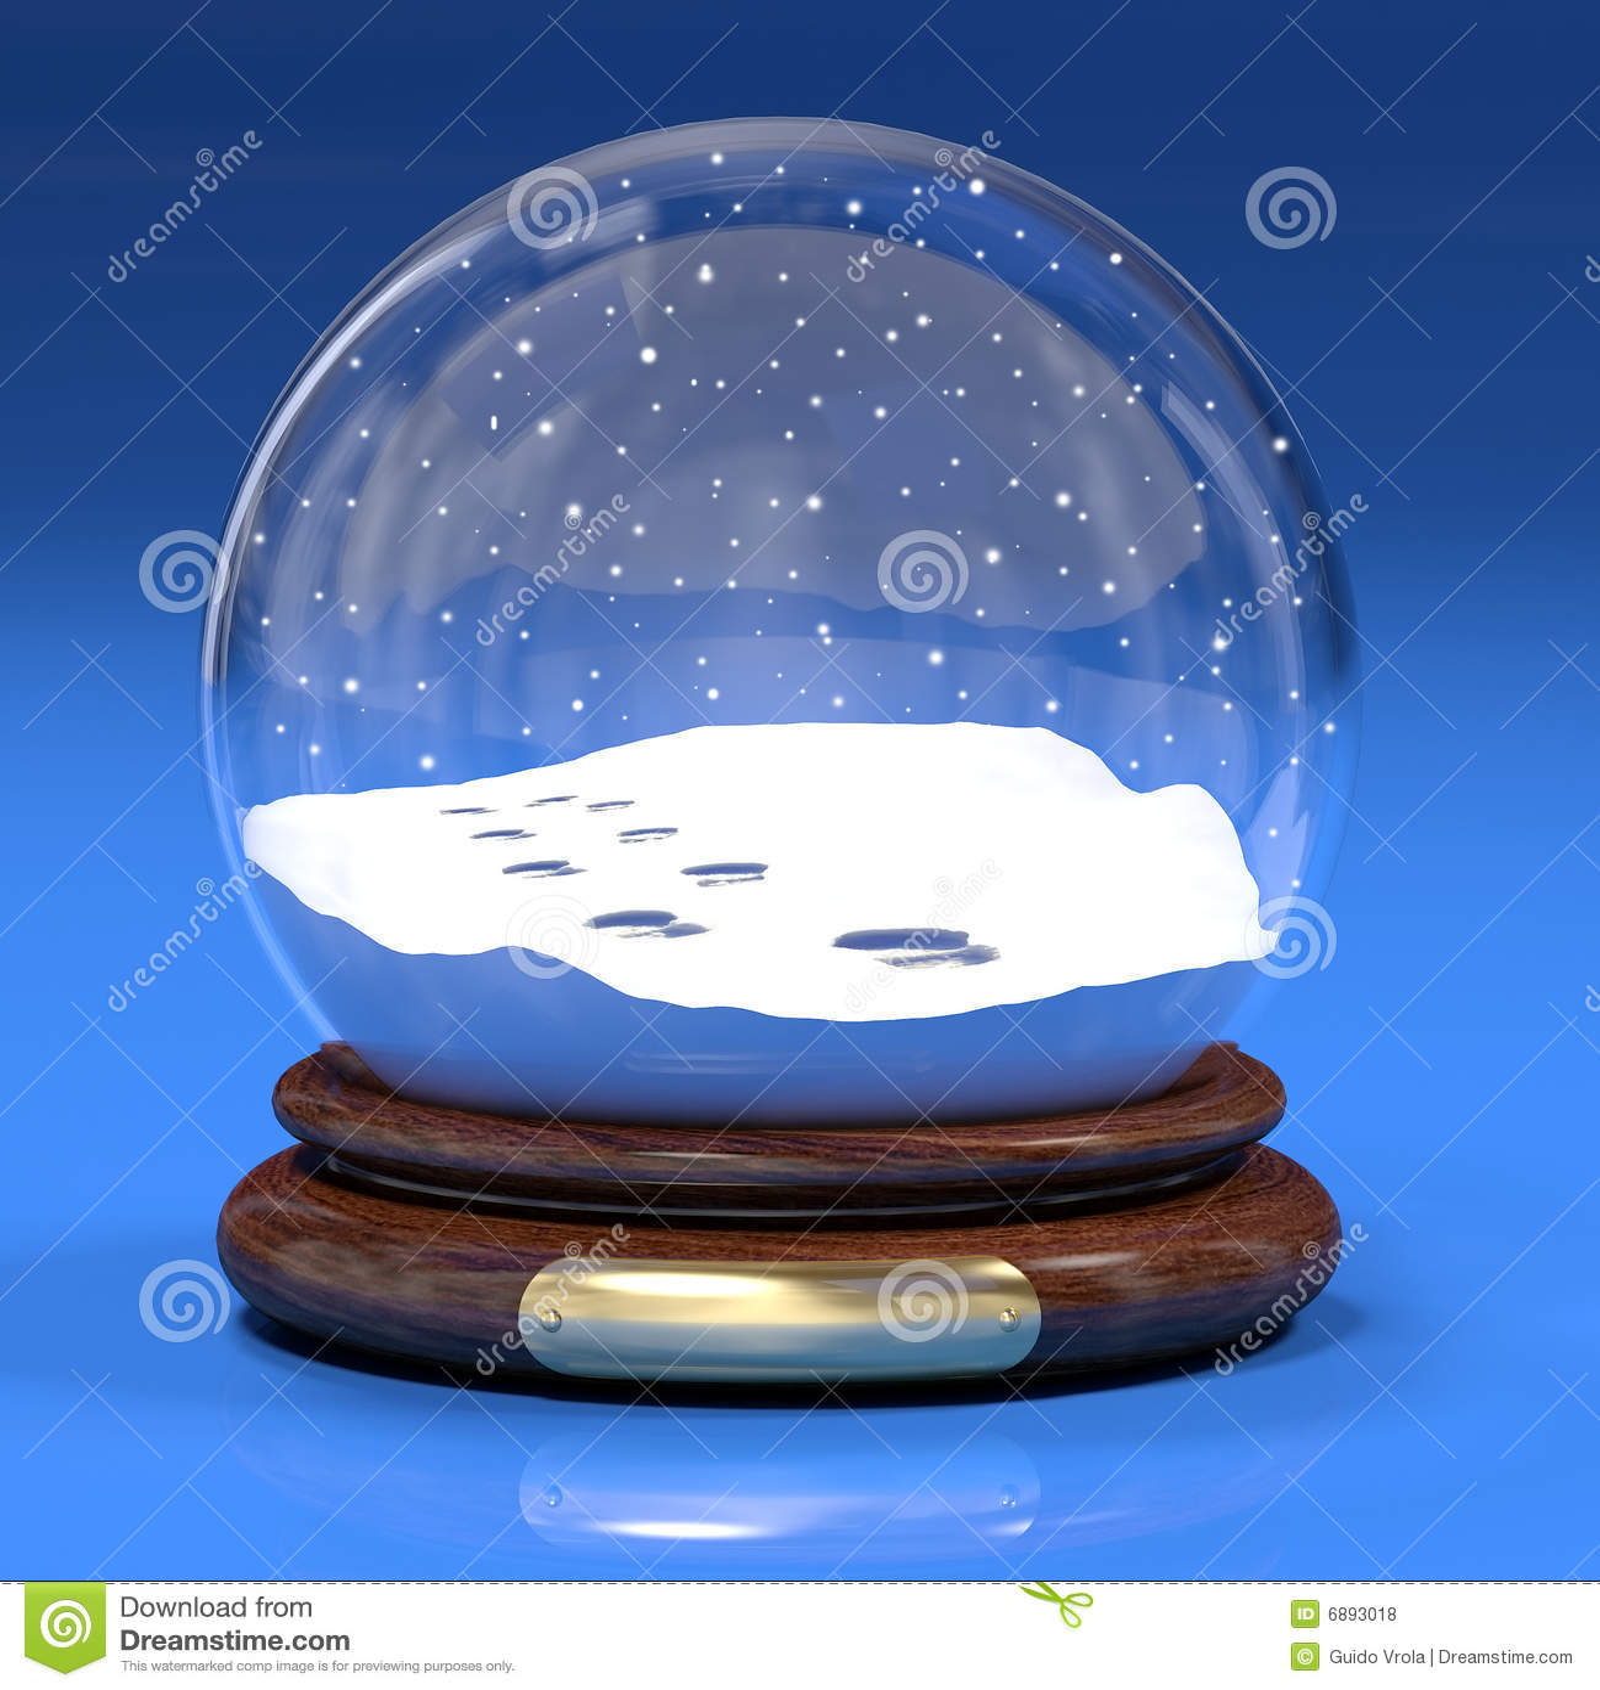 Snowglobe Royalty Free Stock Photos